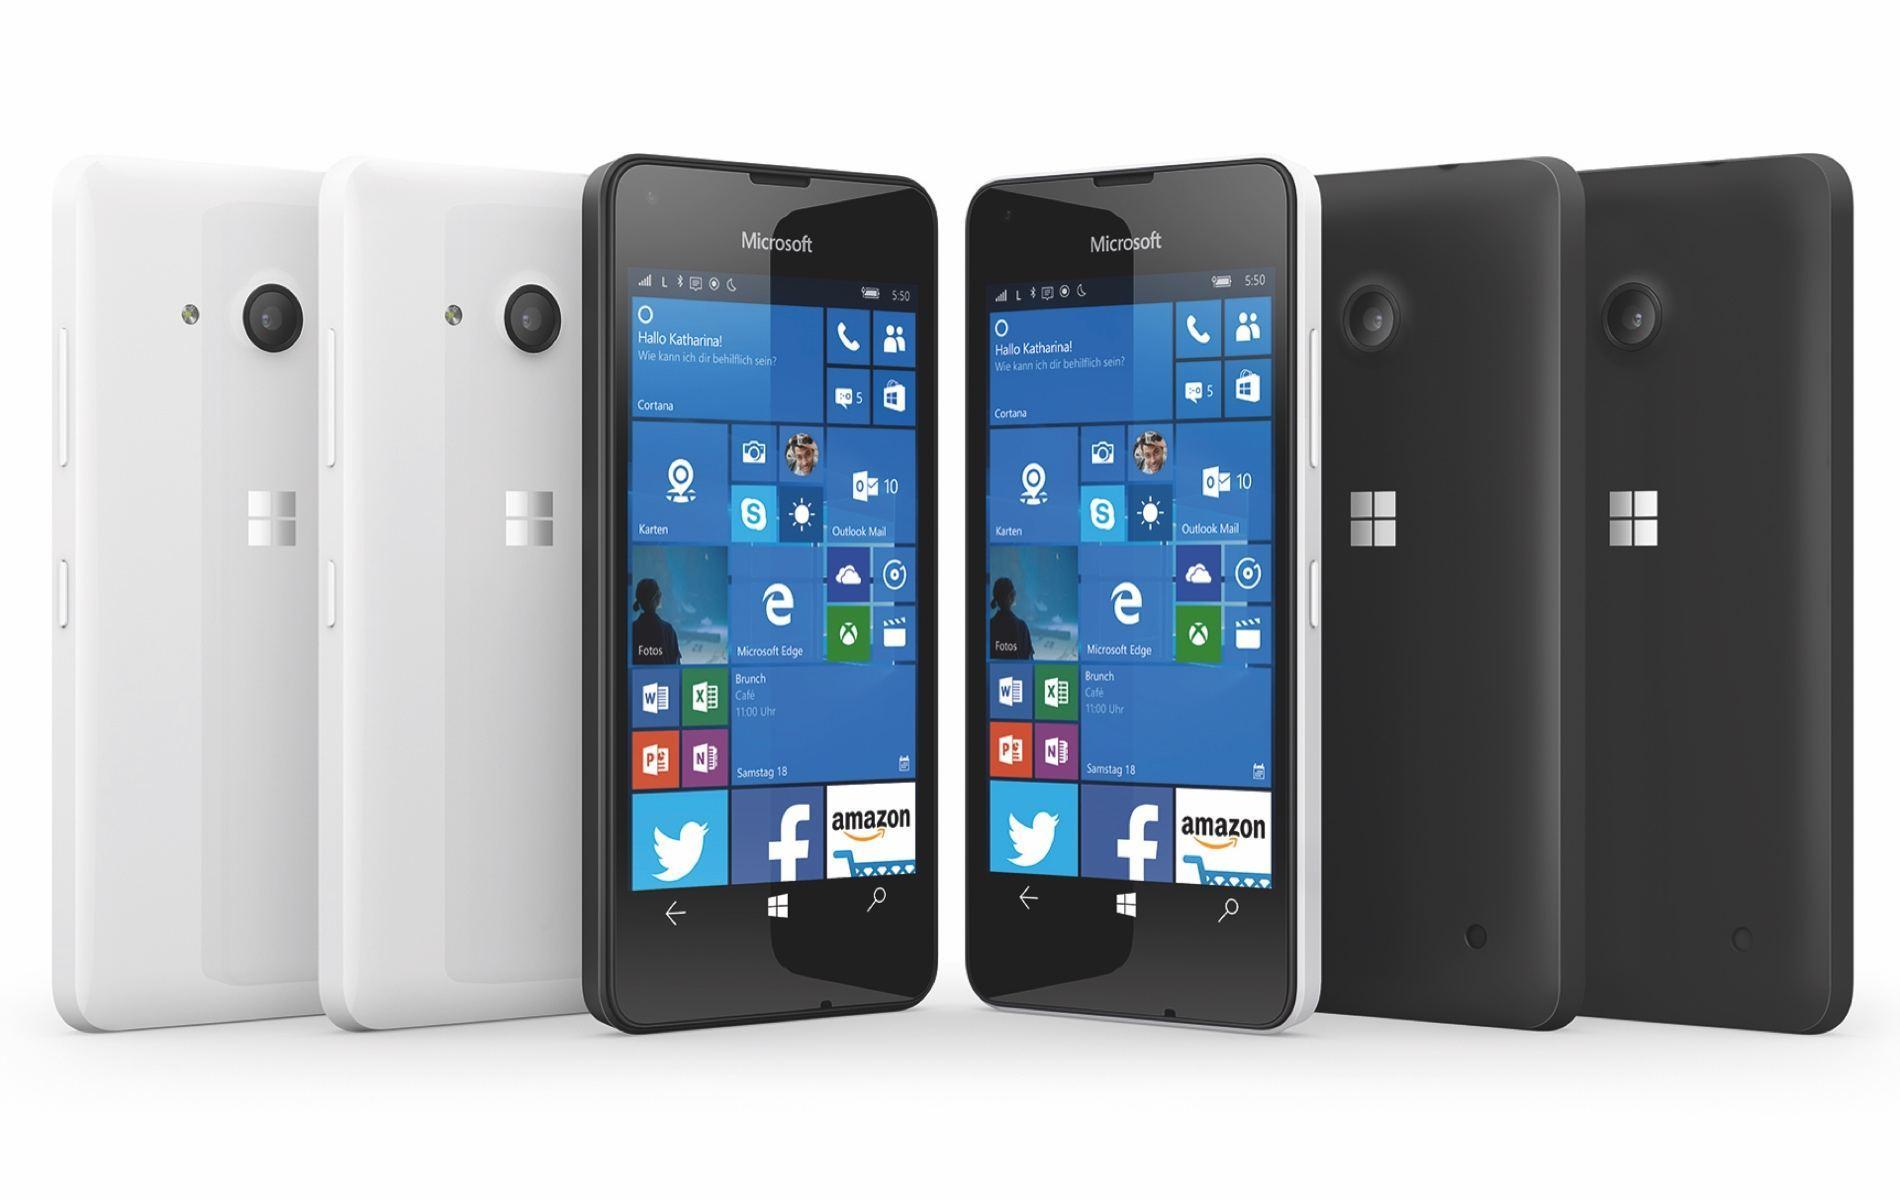 Microsot-650-smartphone-debut-on-Febraury-1